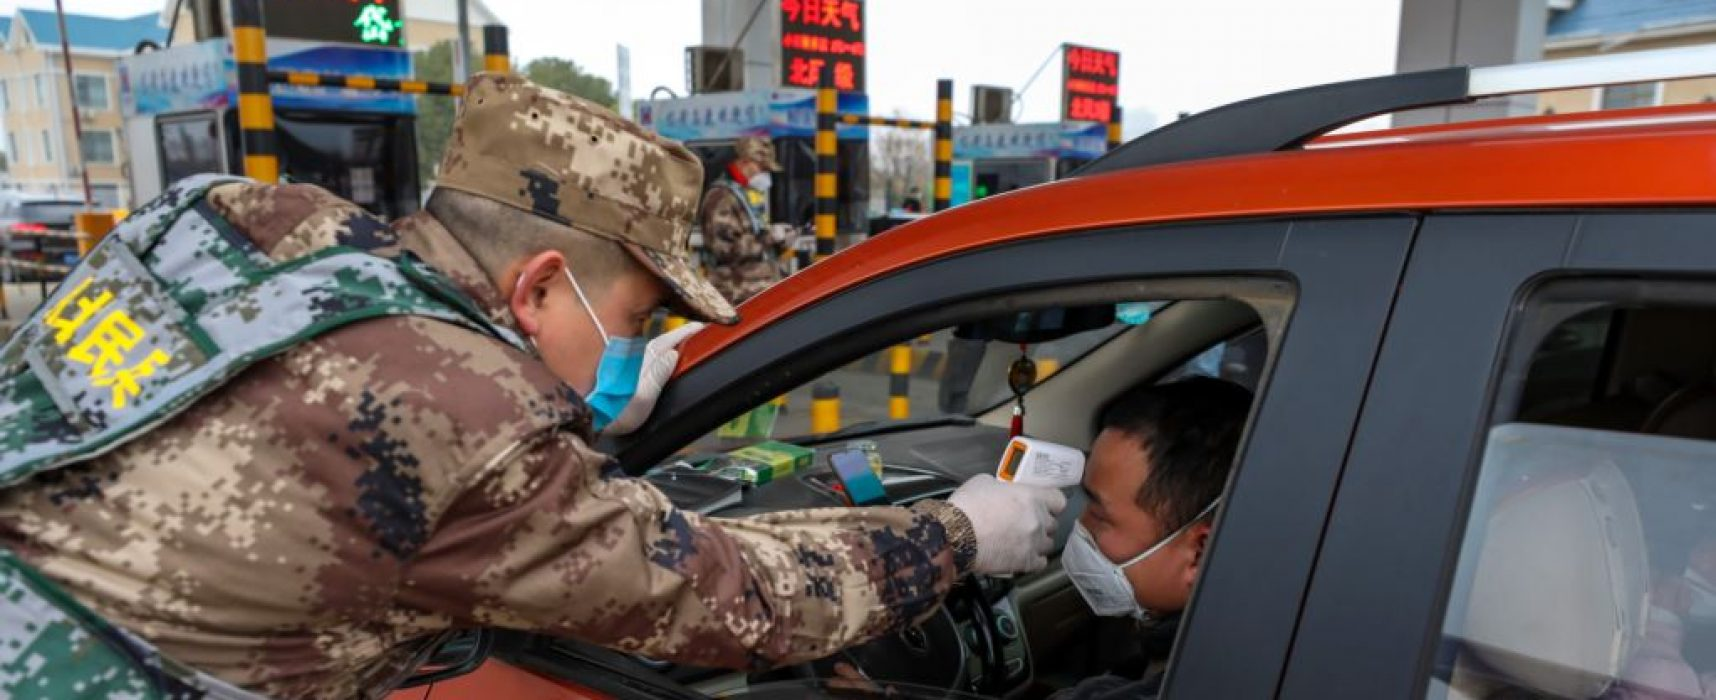 Chinese white paper praises coronavirus response, but critics say secrecy costs lives